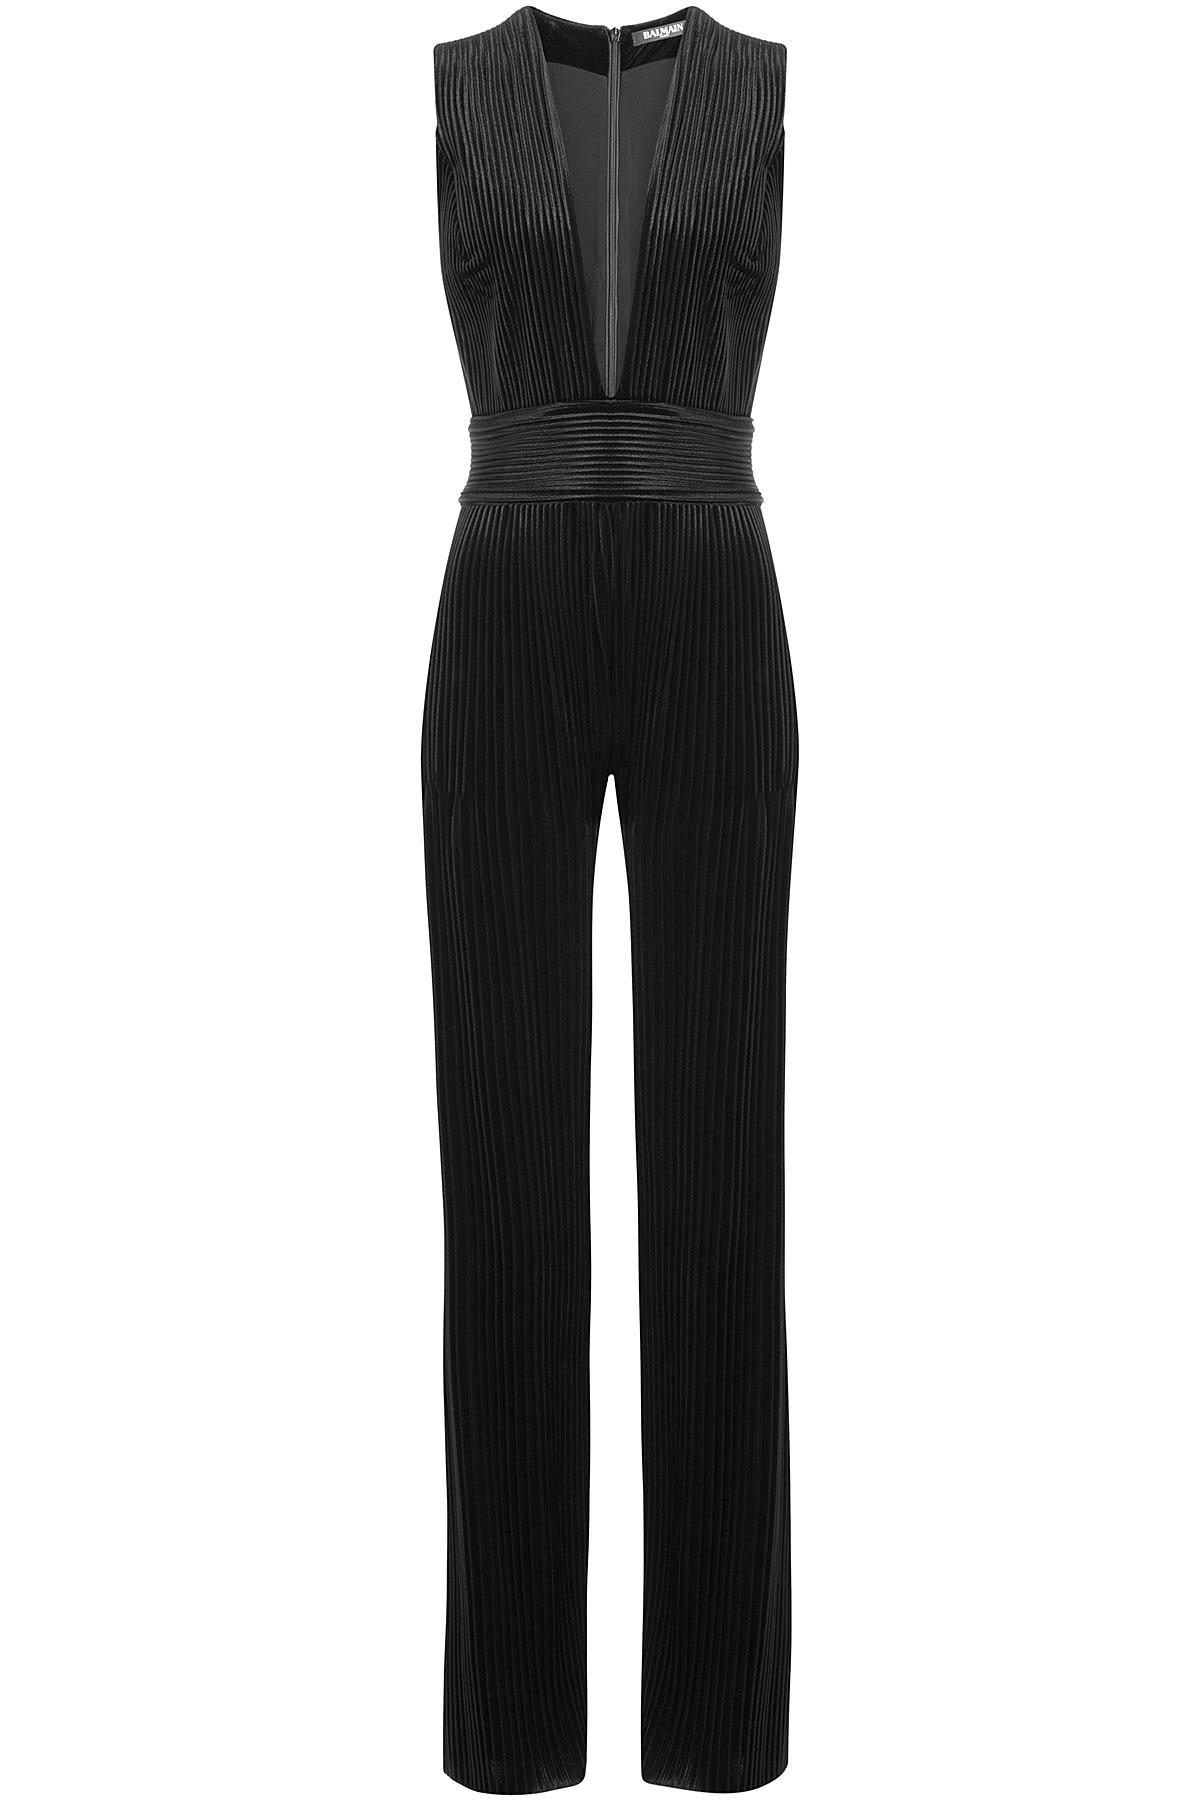 e079c3dc534a Balmain Pleated Jumpsuit - Black in Black - Lyst